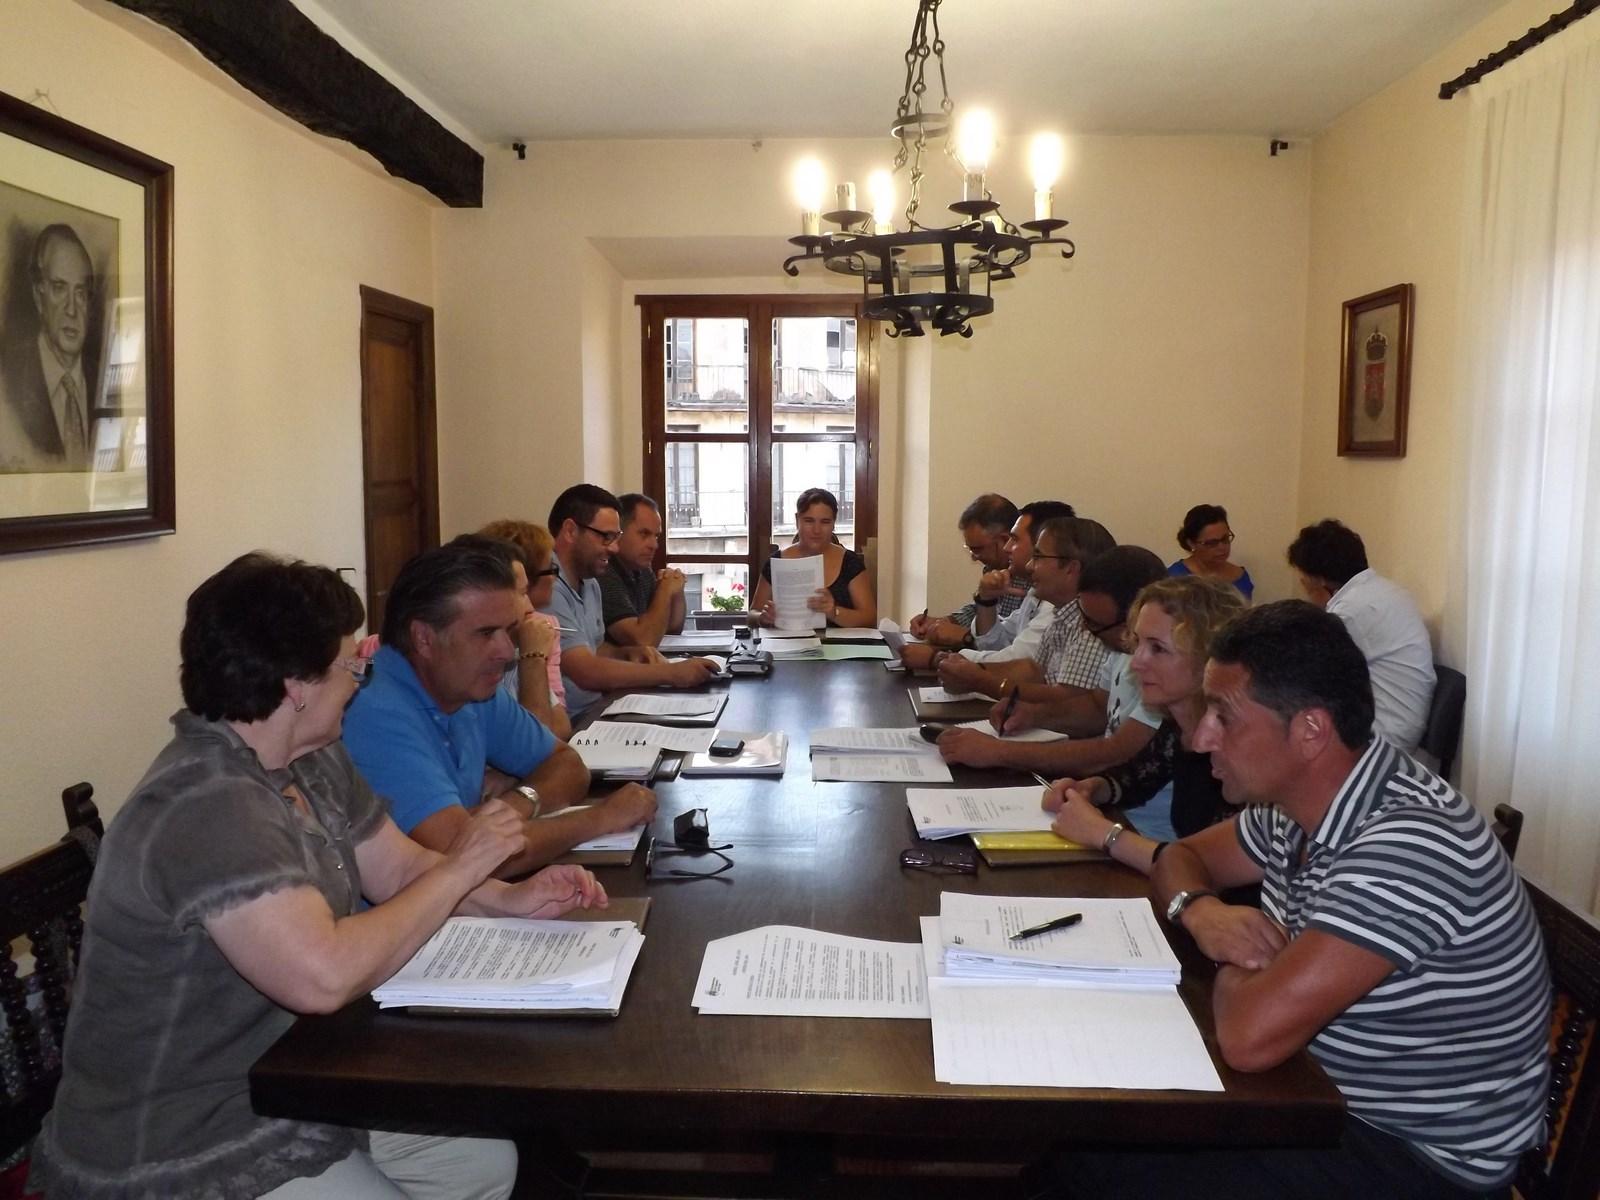 http://www.cabezondelasal.net/wp-content/uploads/2013/08/Pleno-ordinario-de-Agosto.jpg